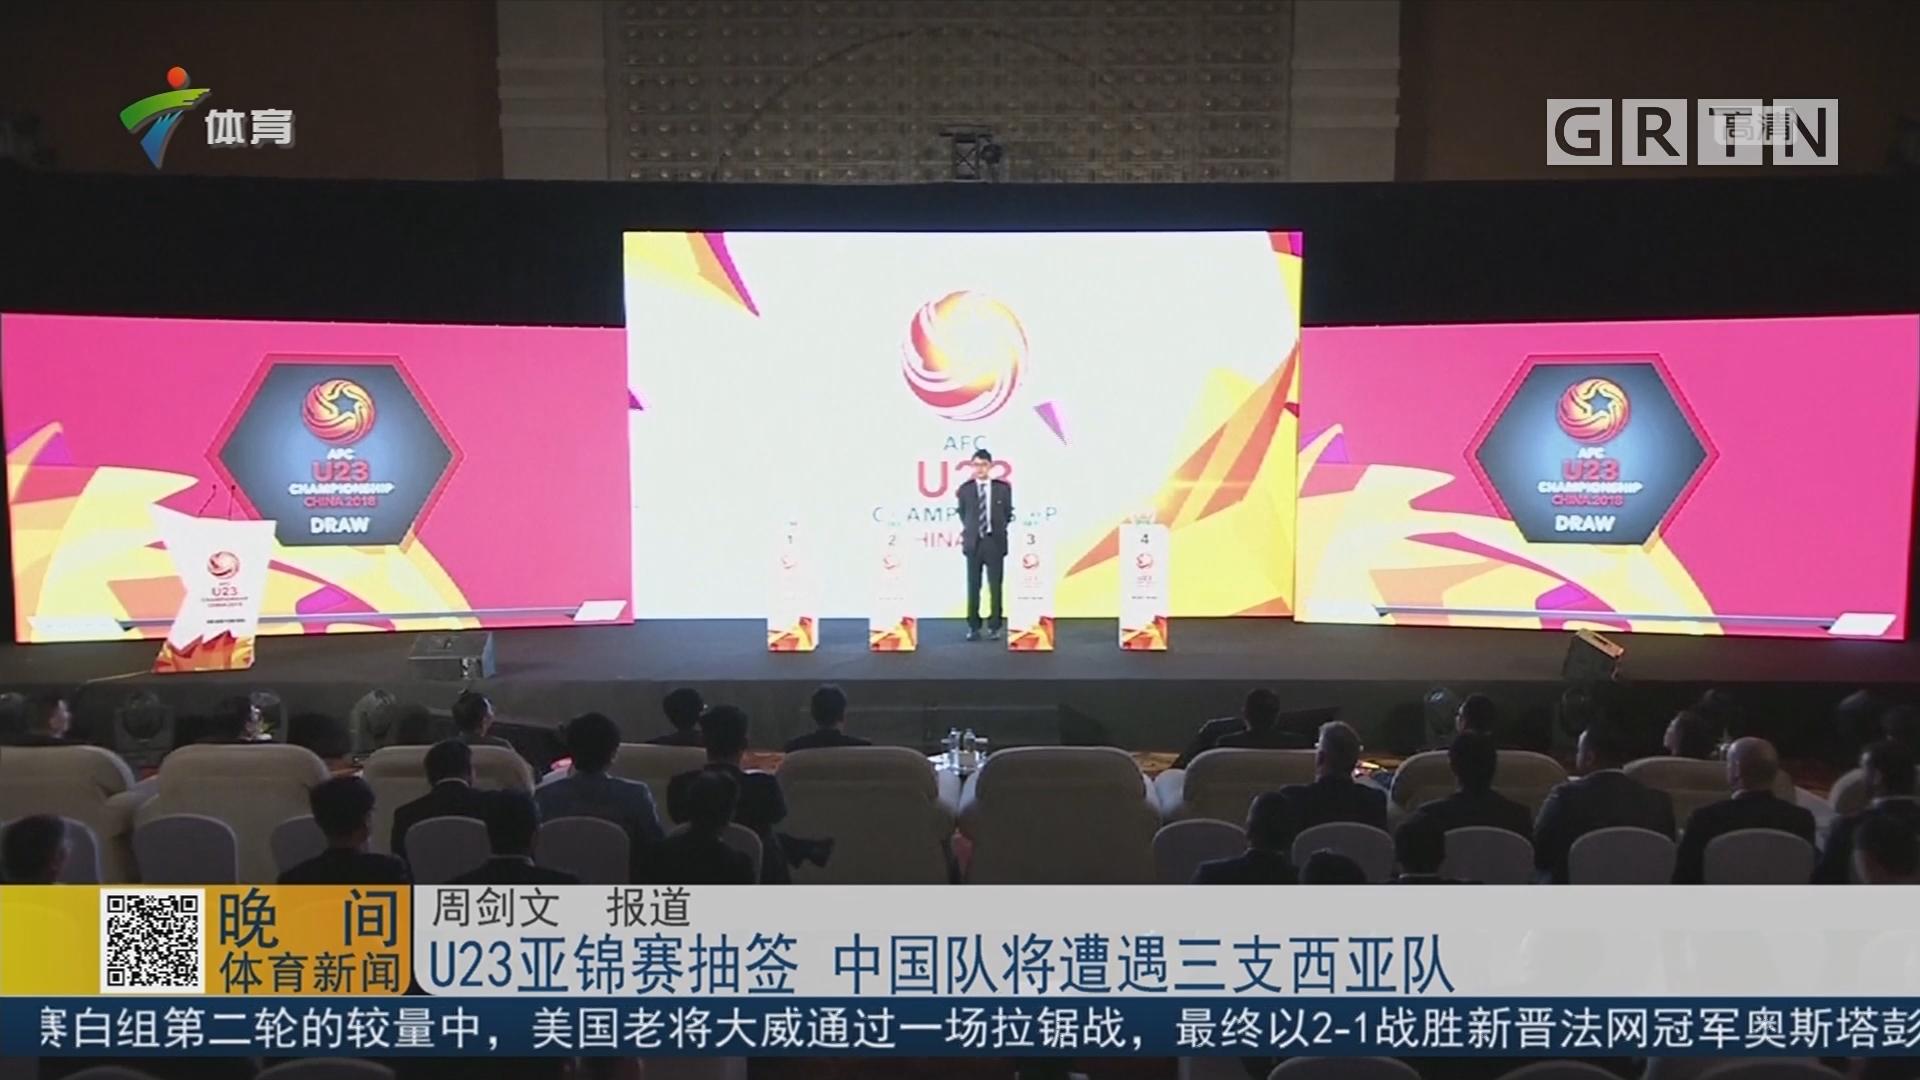 U23亚锦赛抽签 中国队将遭遇三支西亚队